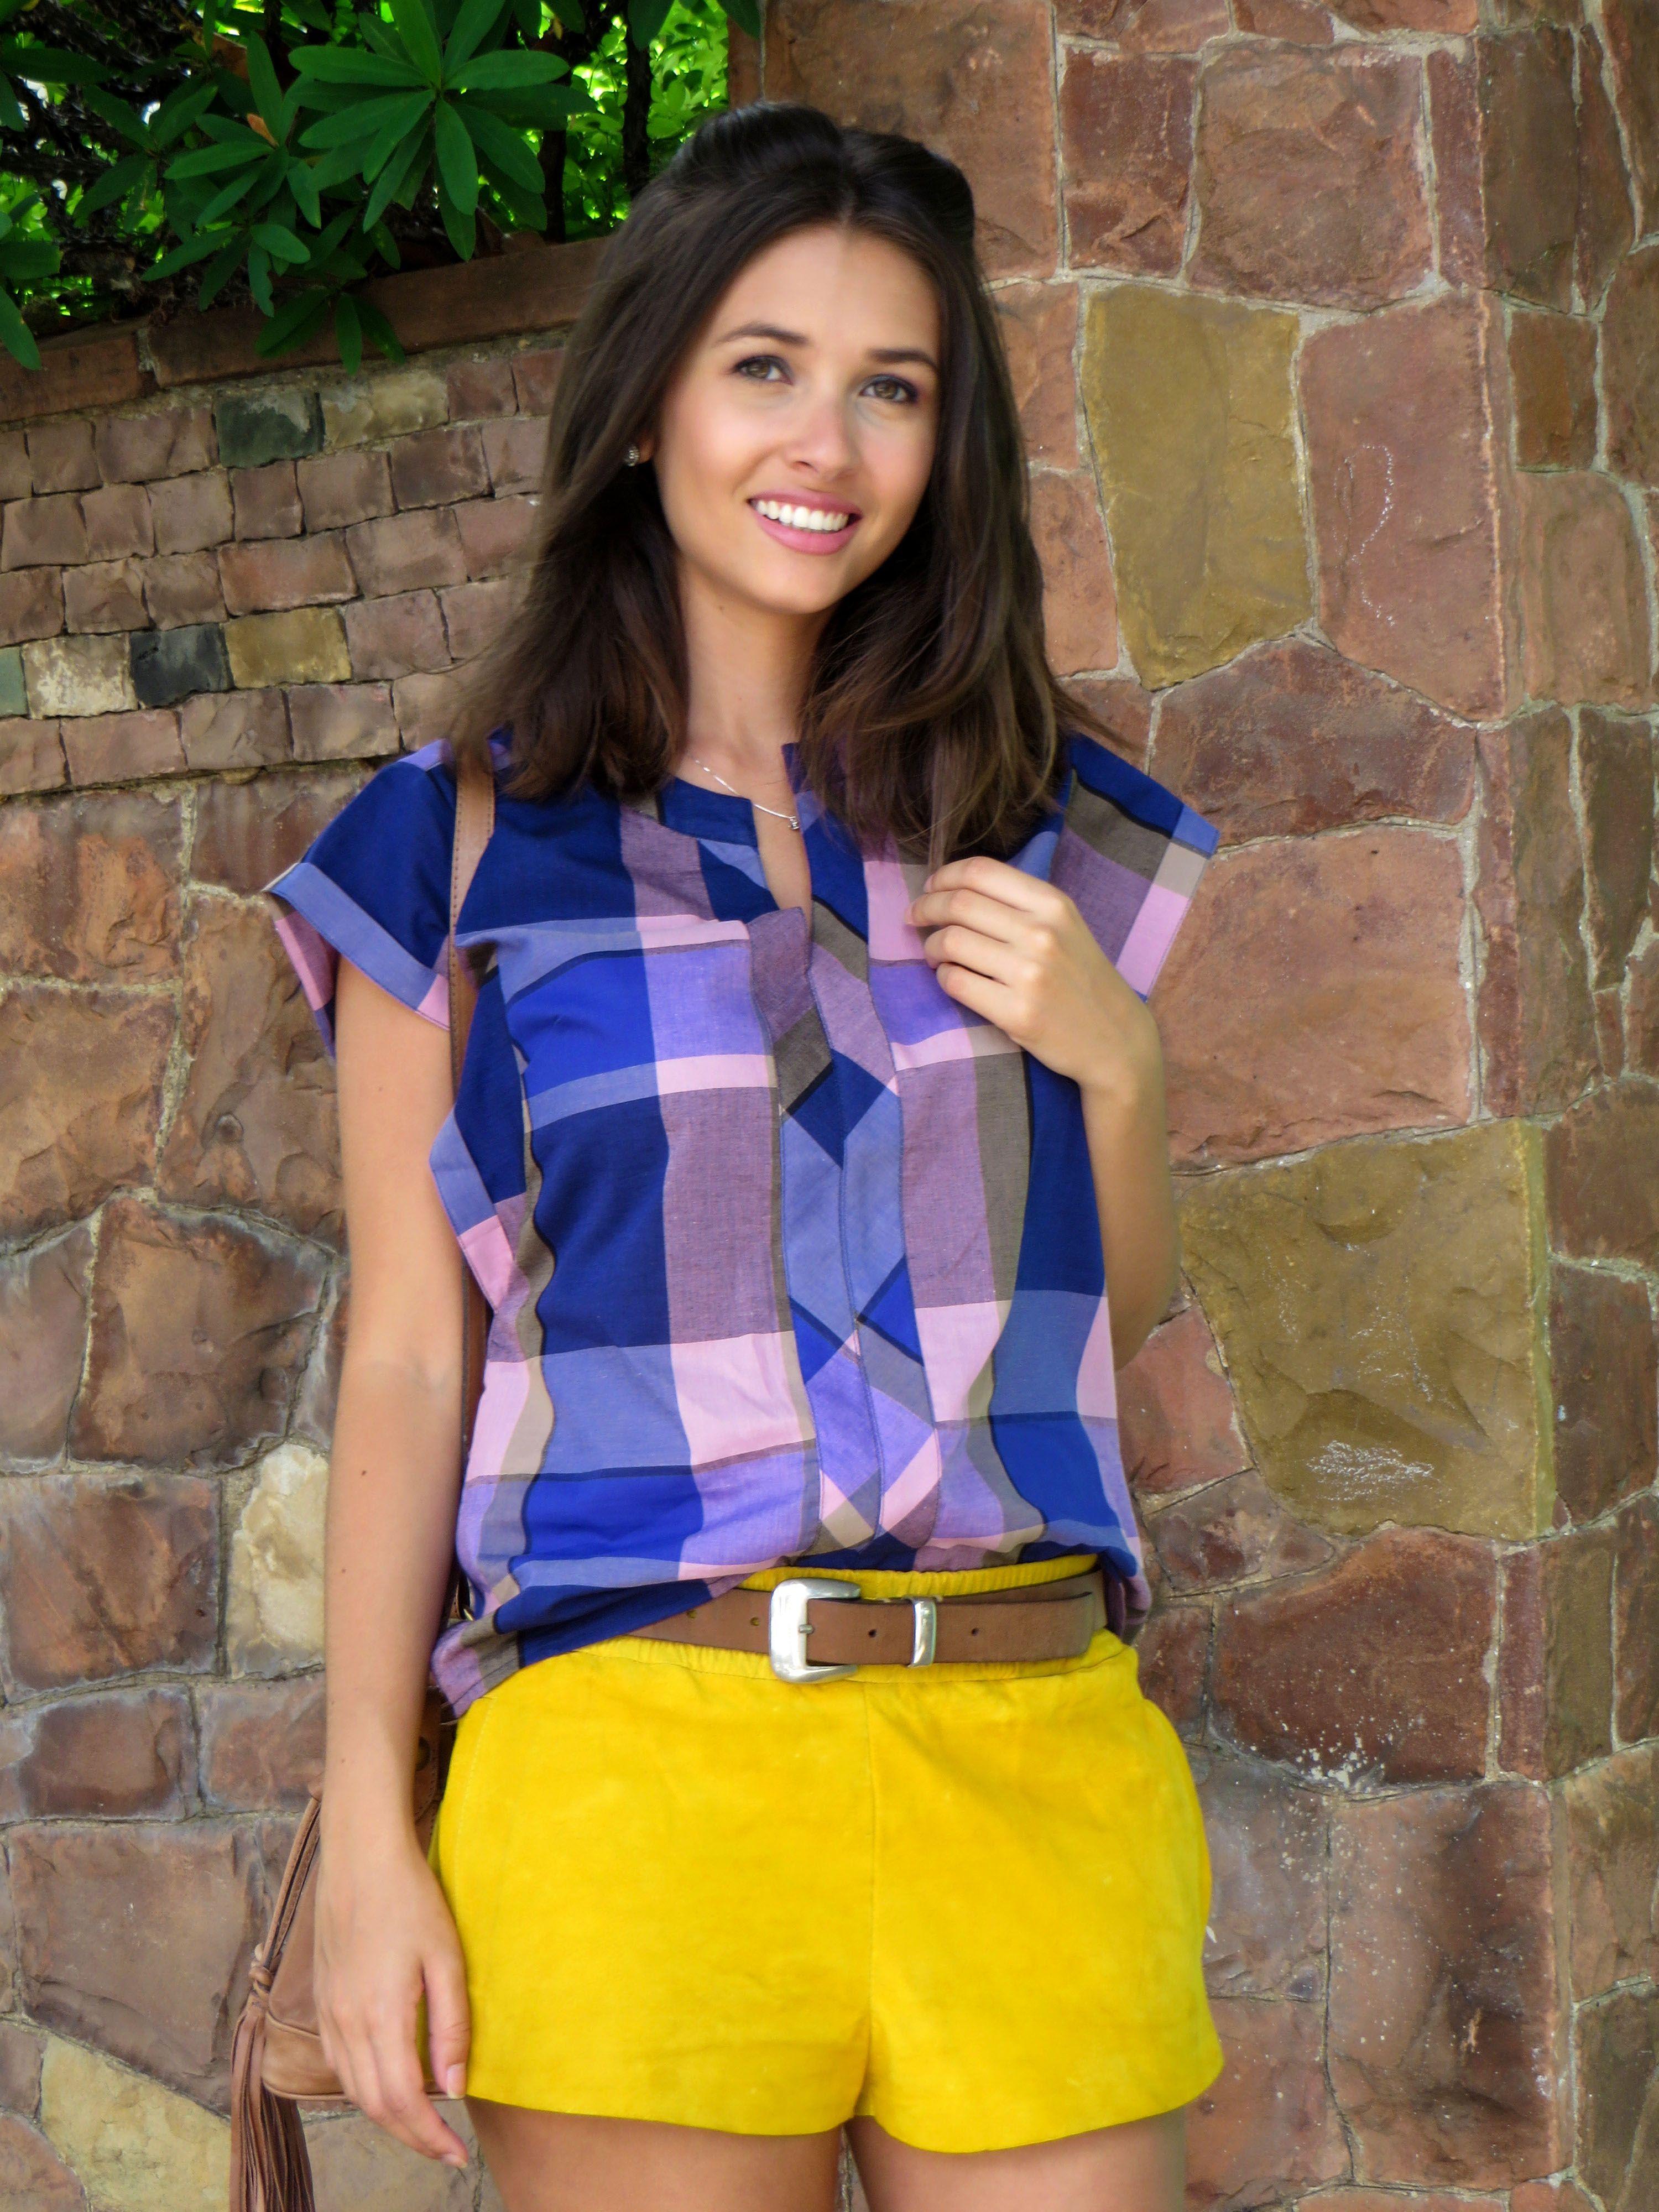 38ba76bbb Blouse plaid in shades of purple with yellow shorts - Blusa xadrez em tons  de roxo usado com um shorts amarelo